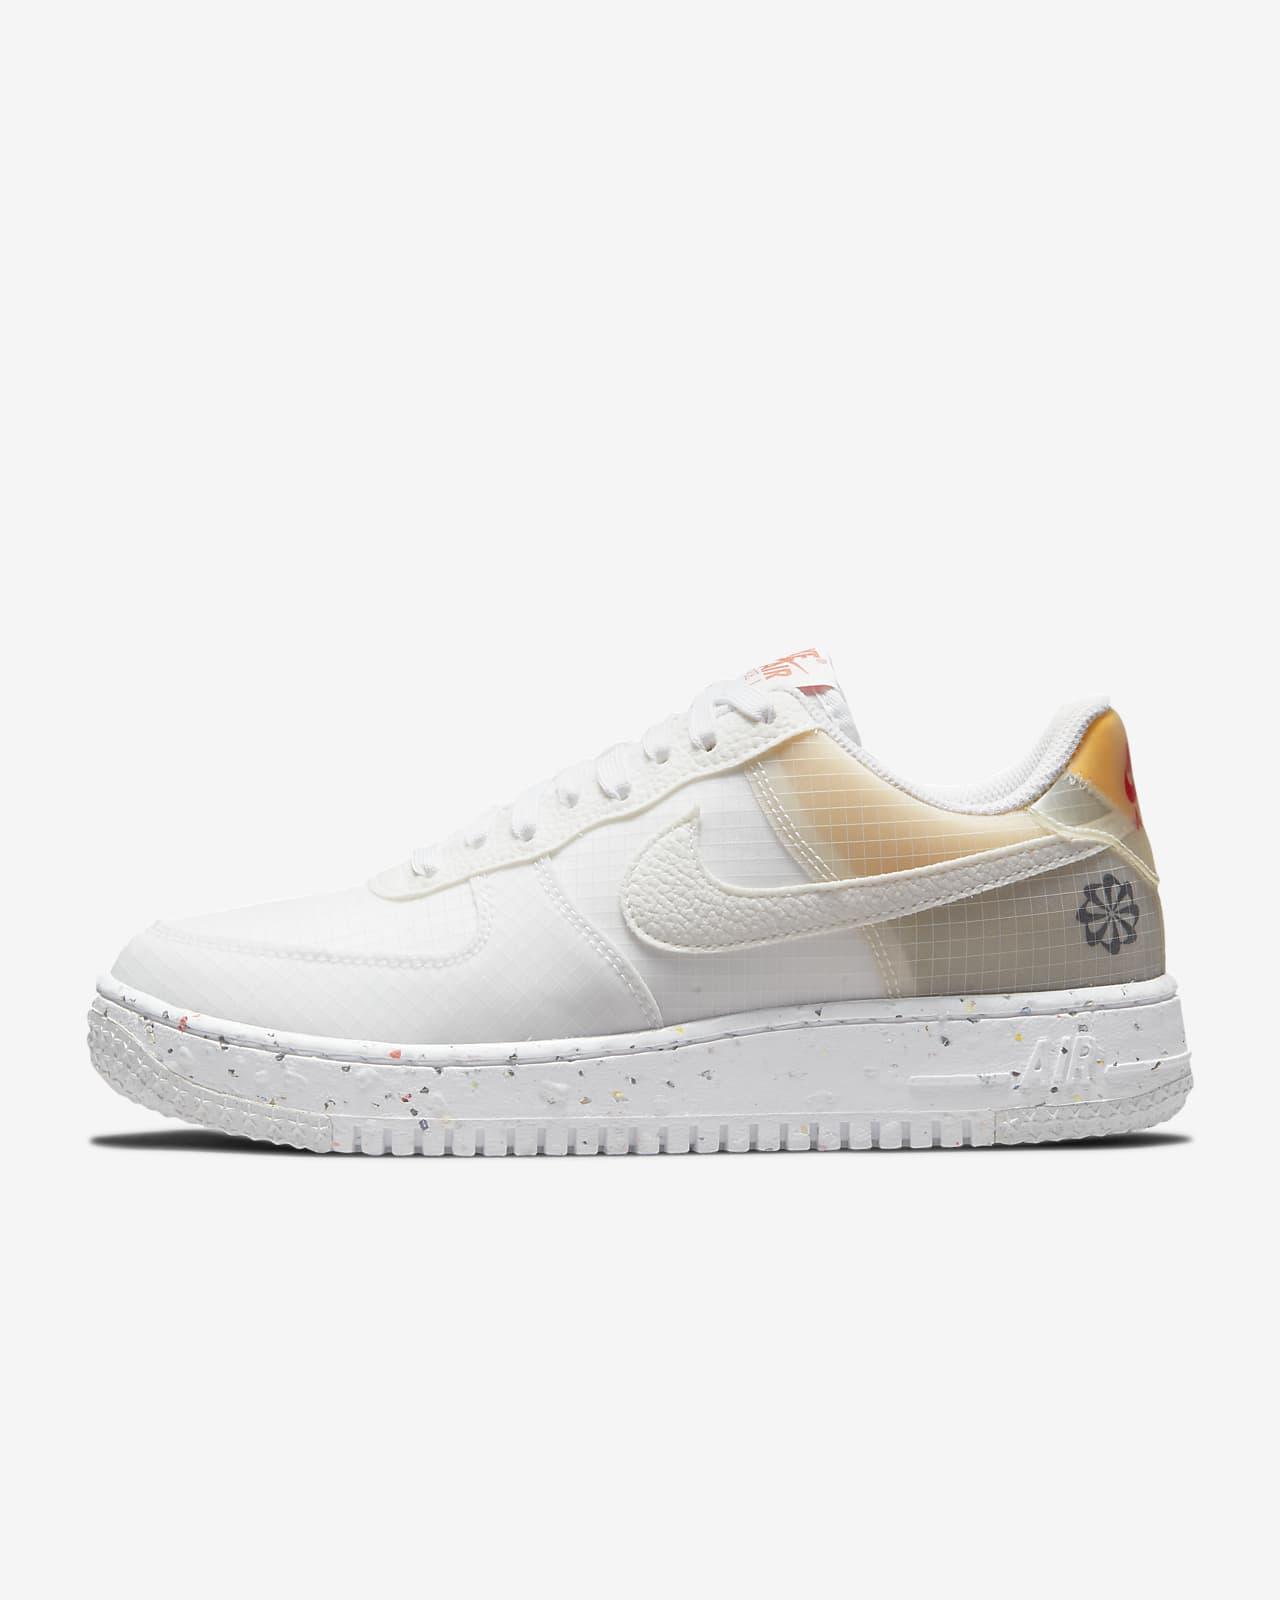 Nike Air Force 1 Crater Damenschuh